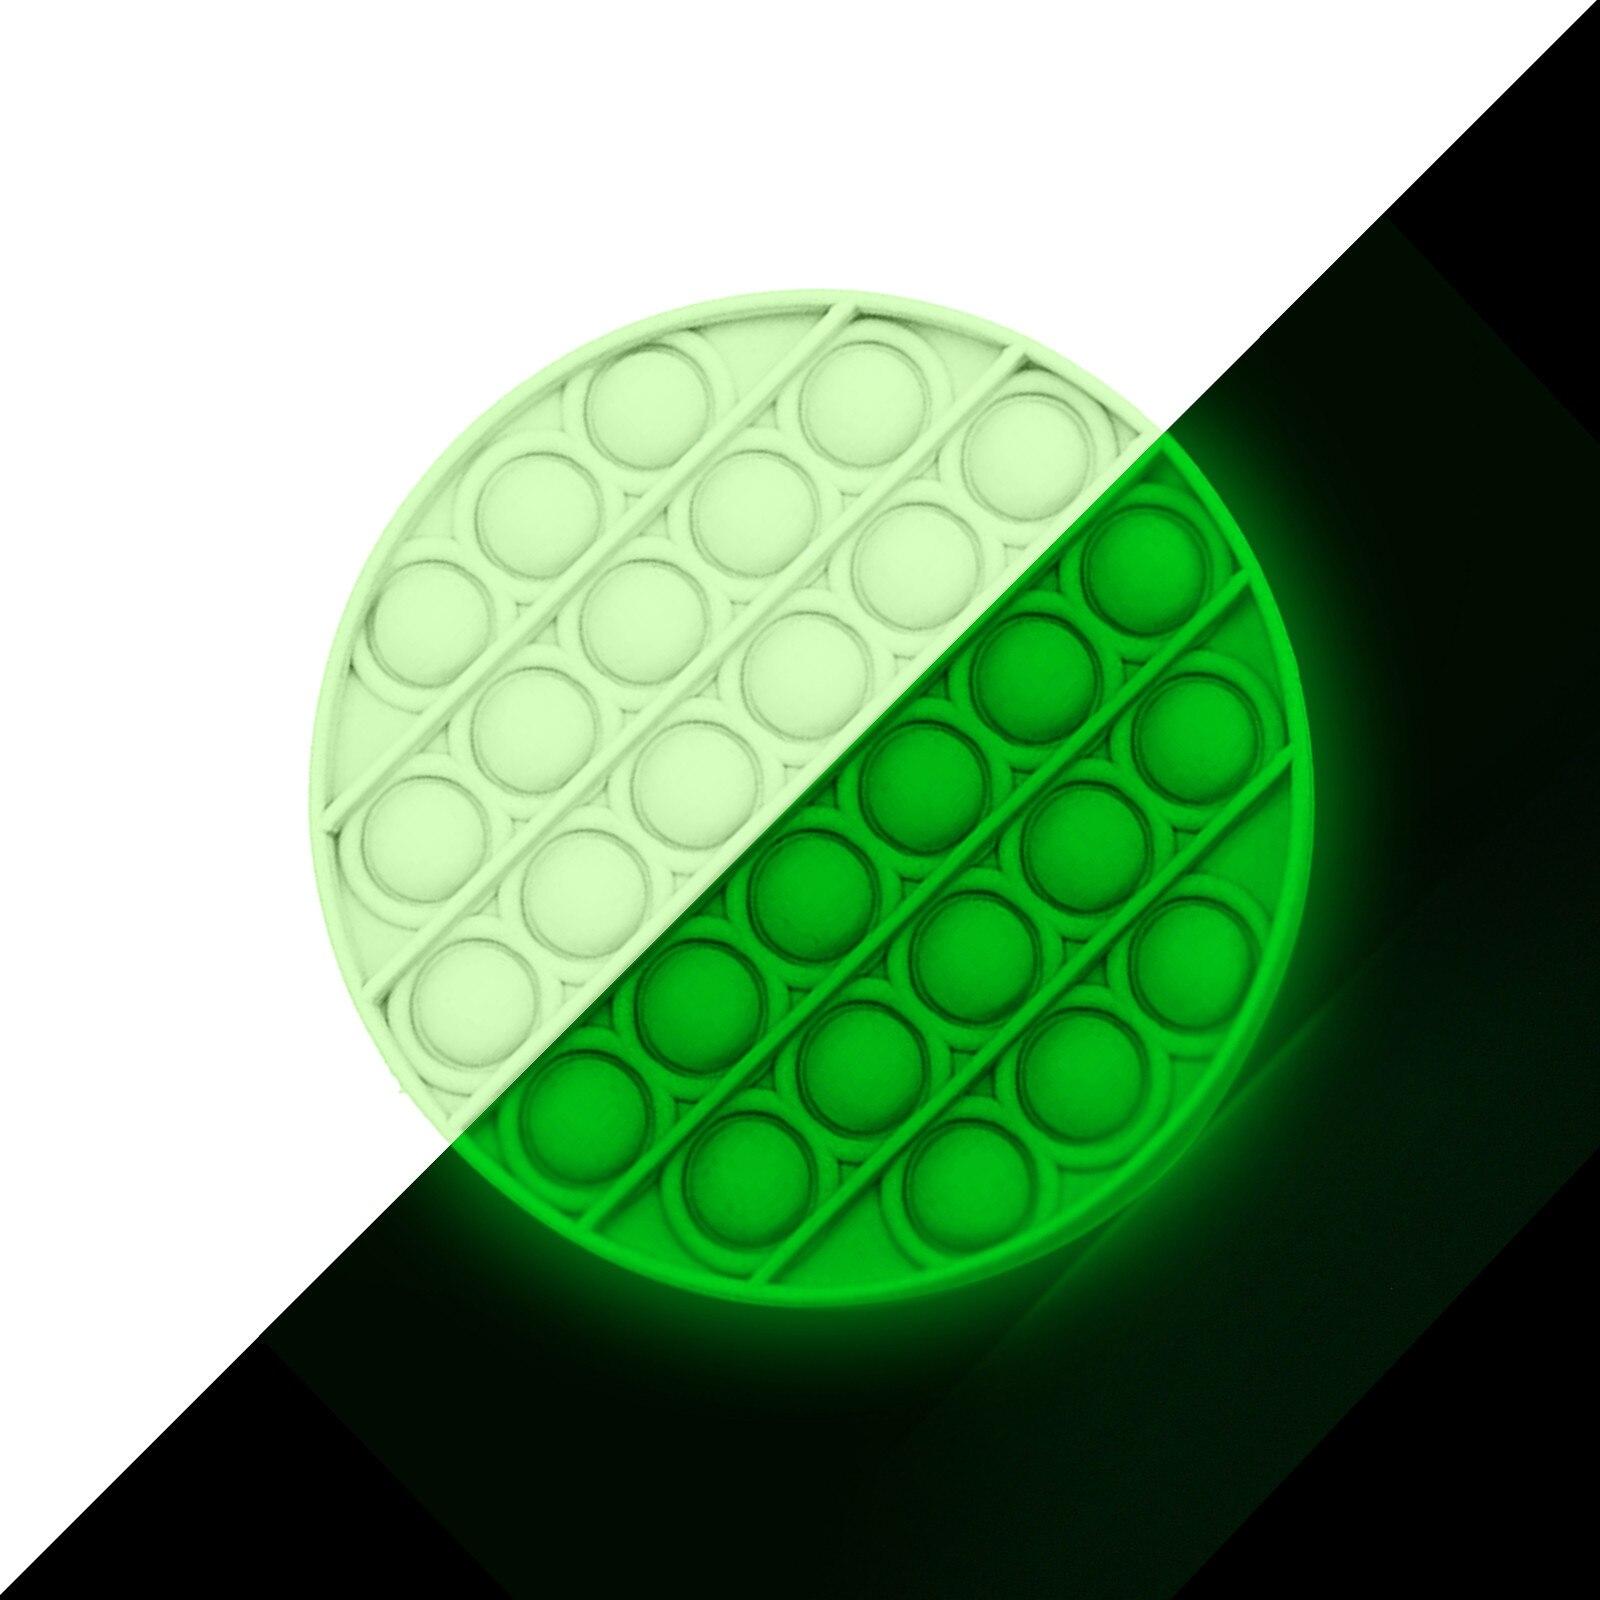 Toy Bubble-Fidget Fidget-Sensory Toy-Stress Relief Adult Glow-In-The-Dark Push Kids img2